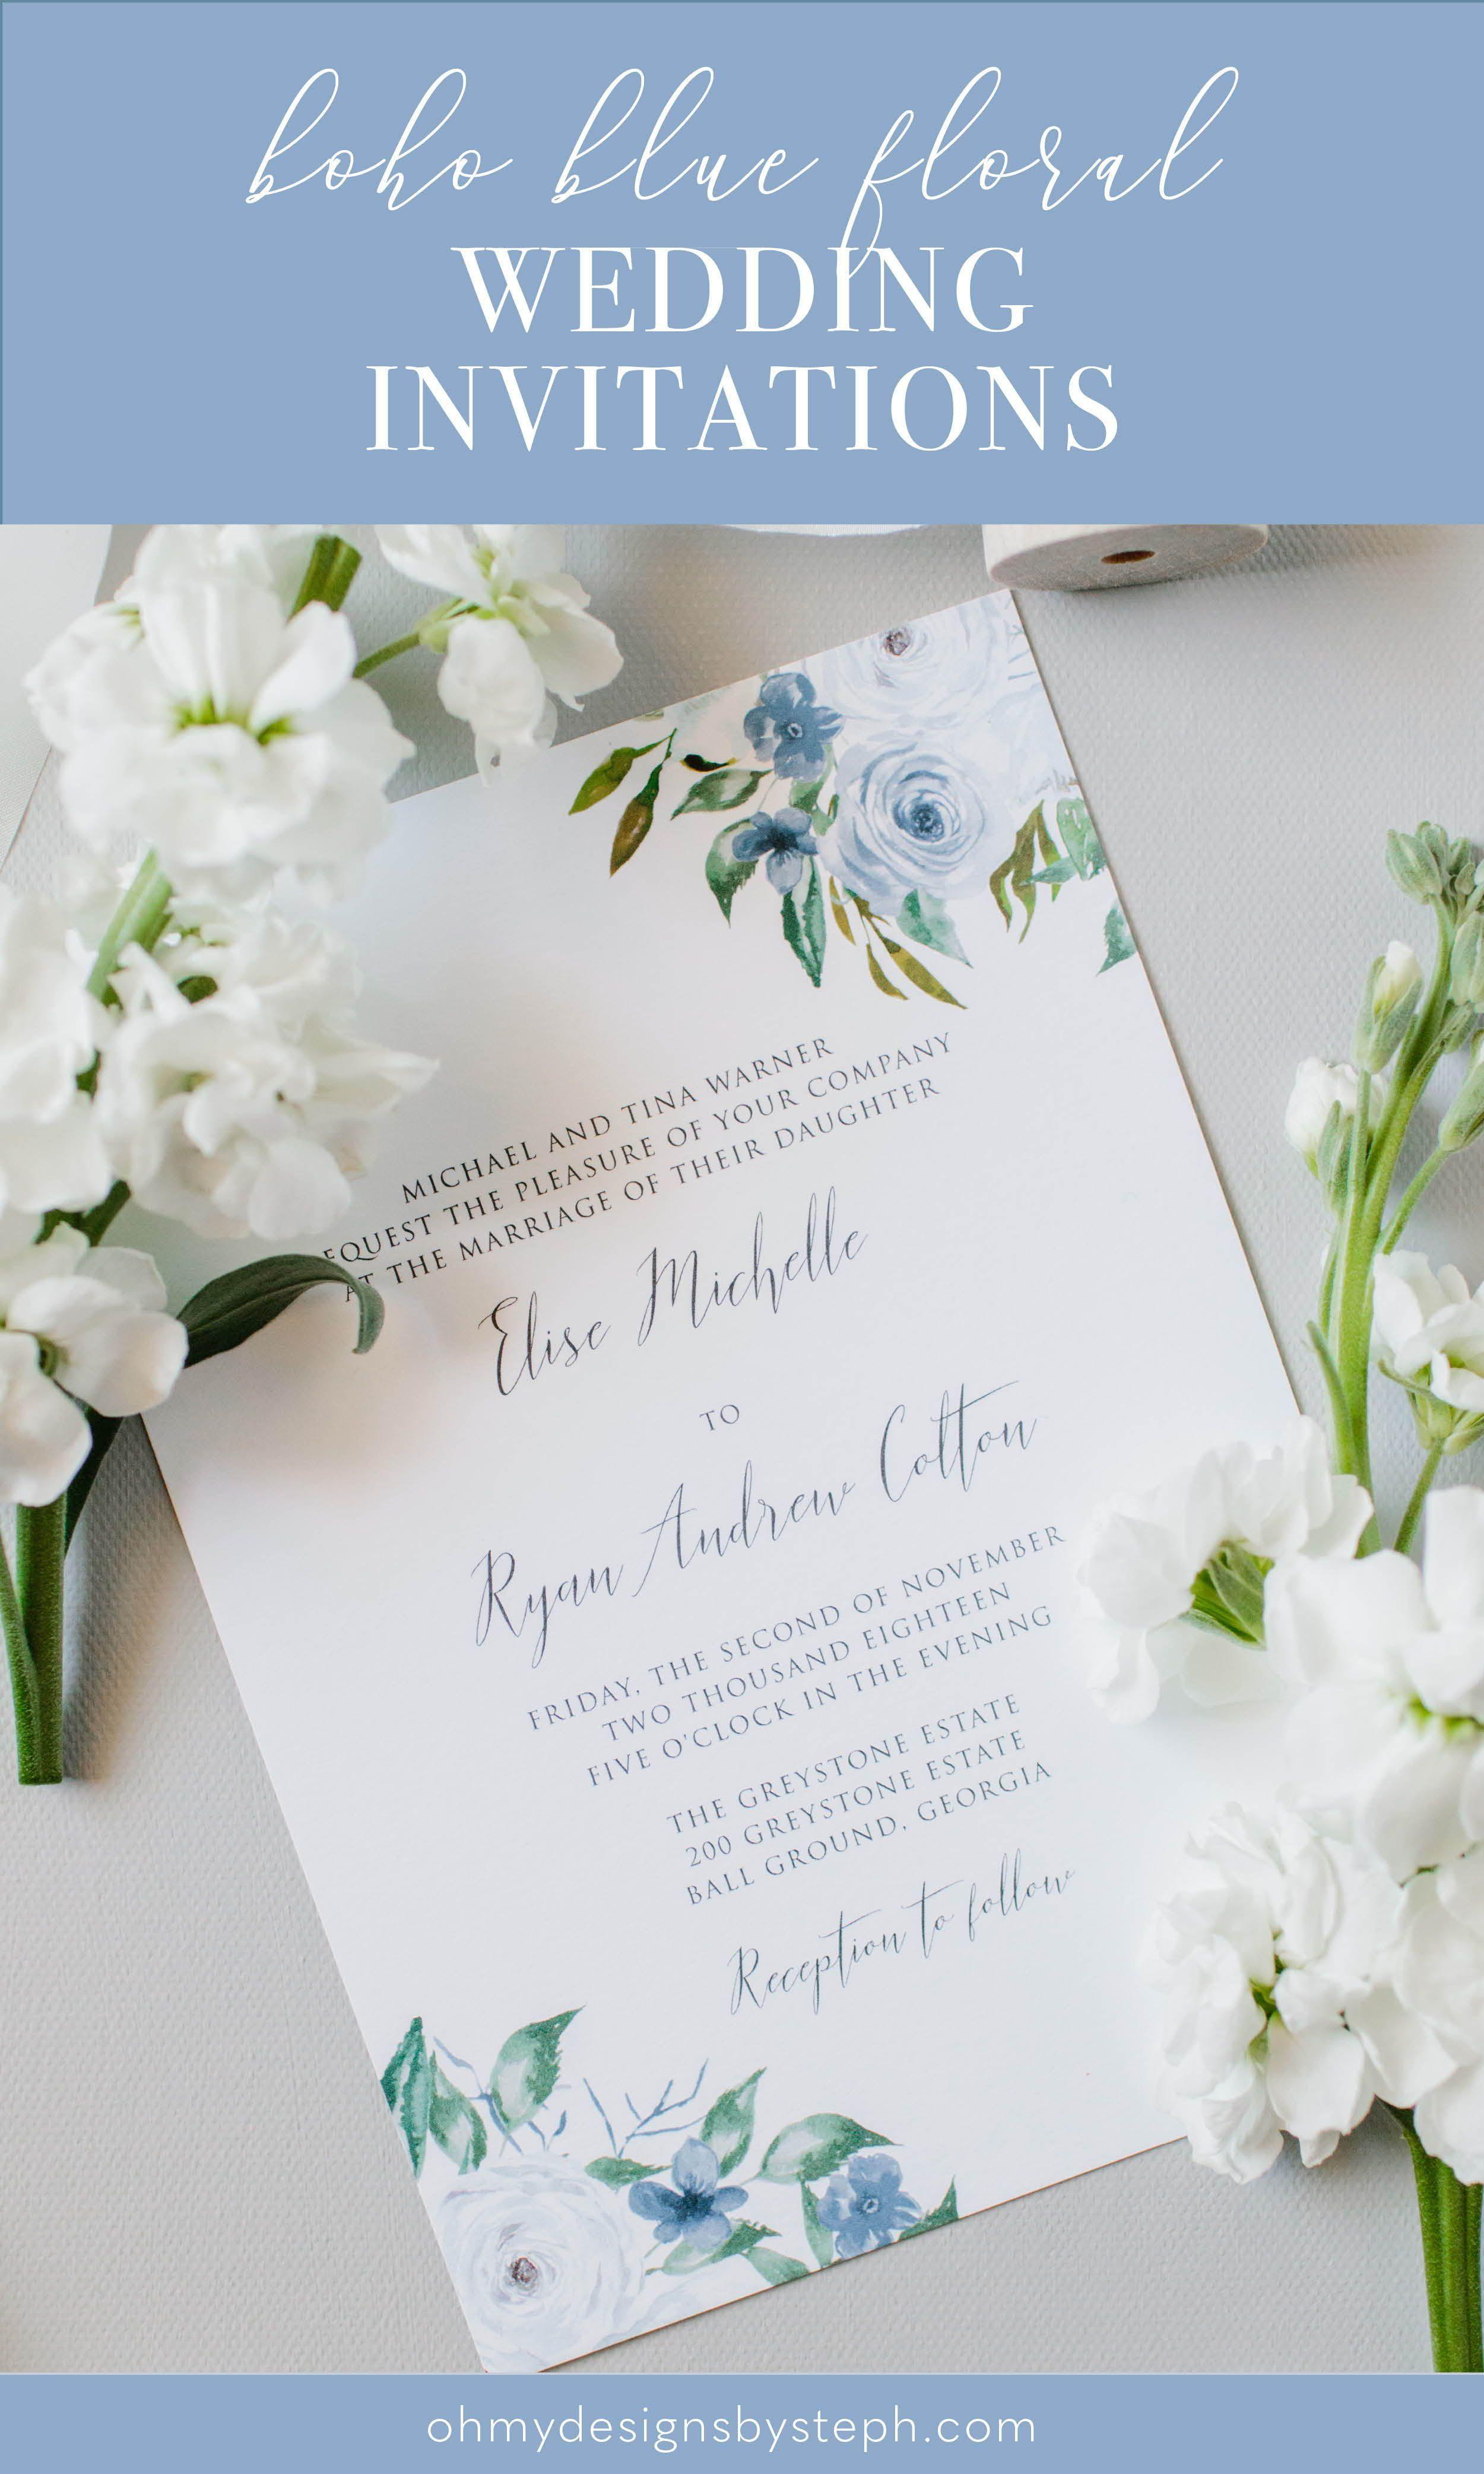 Dusty Blue Floral Wedding Invitation Set Slate Blue Summer Etsy Floral Wedding Invitations Wedding Invitations Wedding Invitation Templates